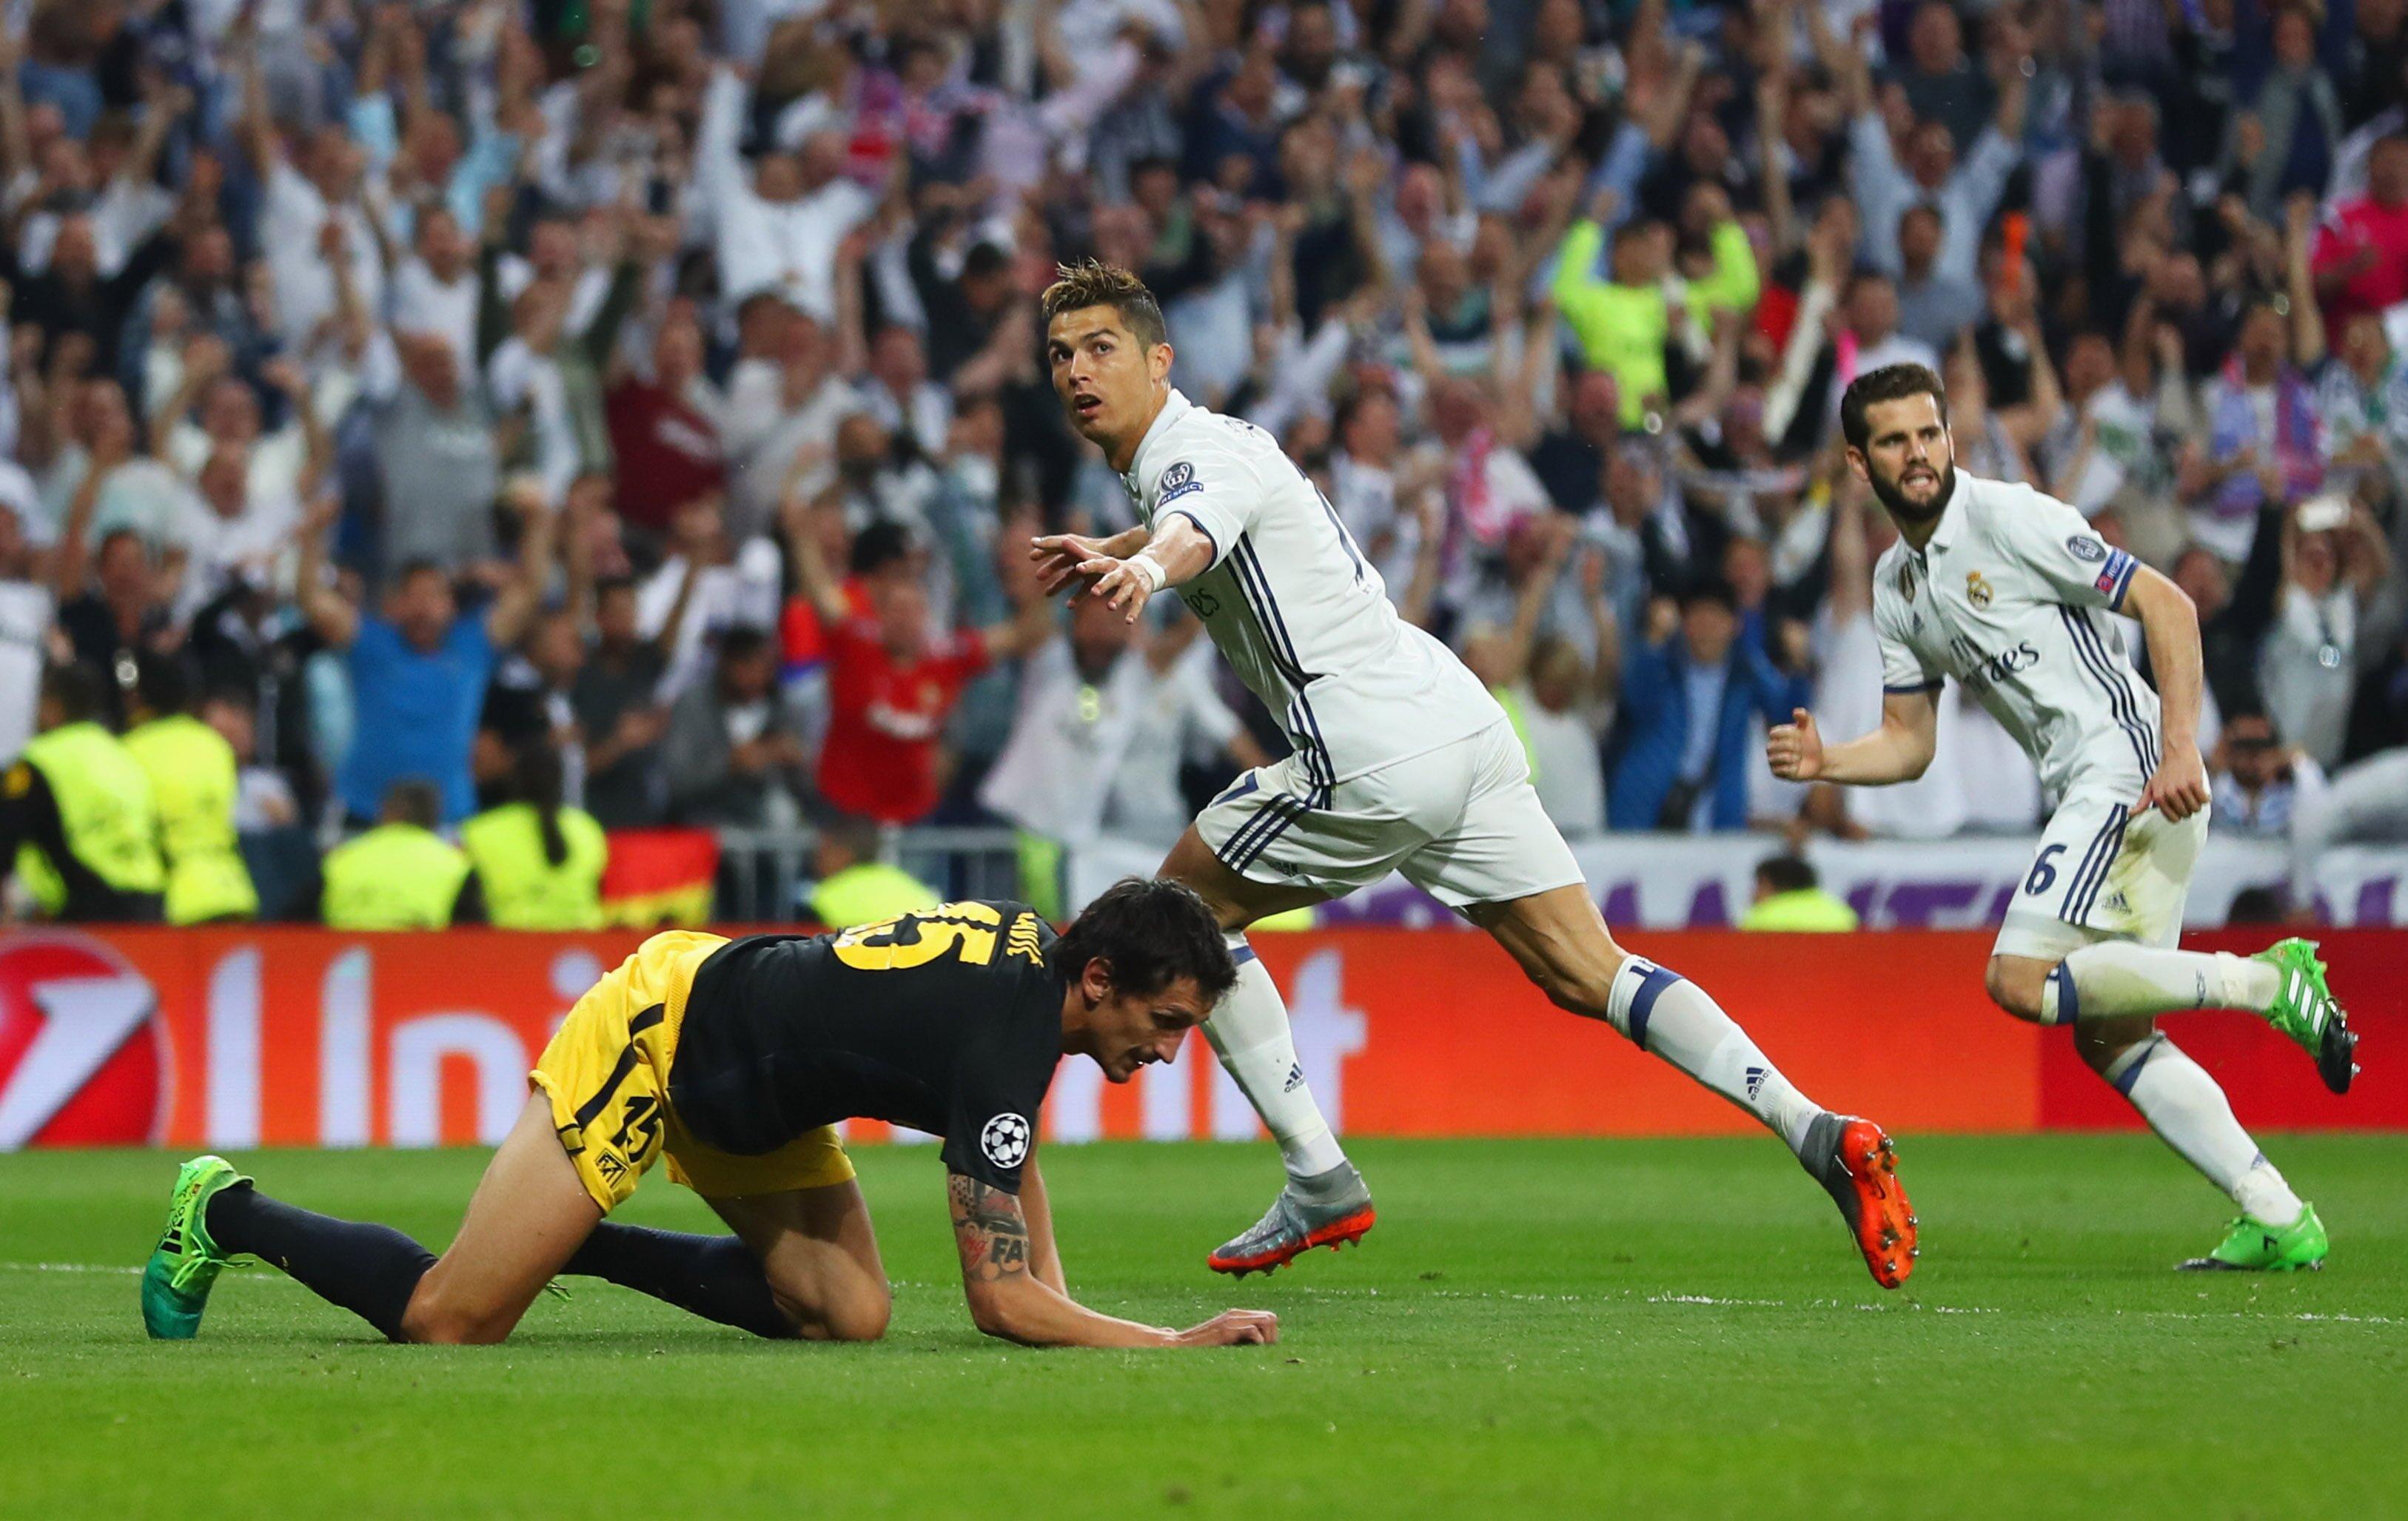 Photo of Cristiano Ronaldo'lu Real Madrid Şampiyonlar Ligi Finaline Çok Yakın